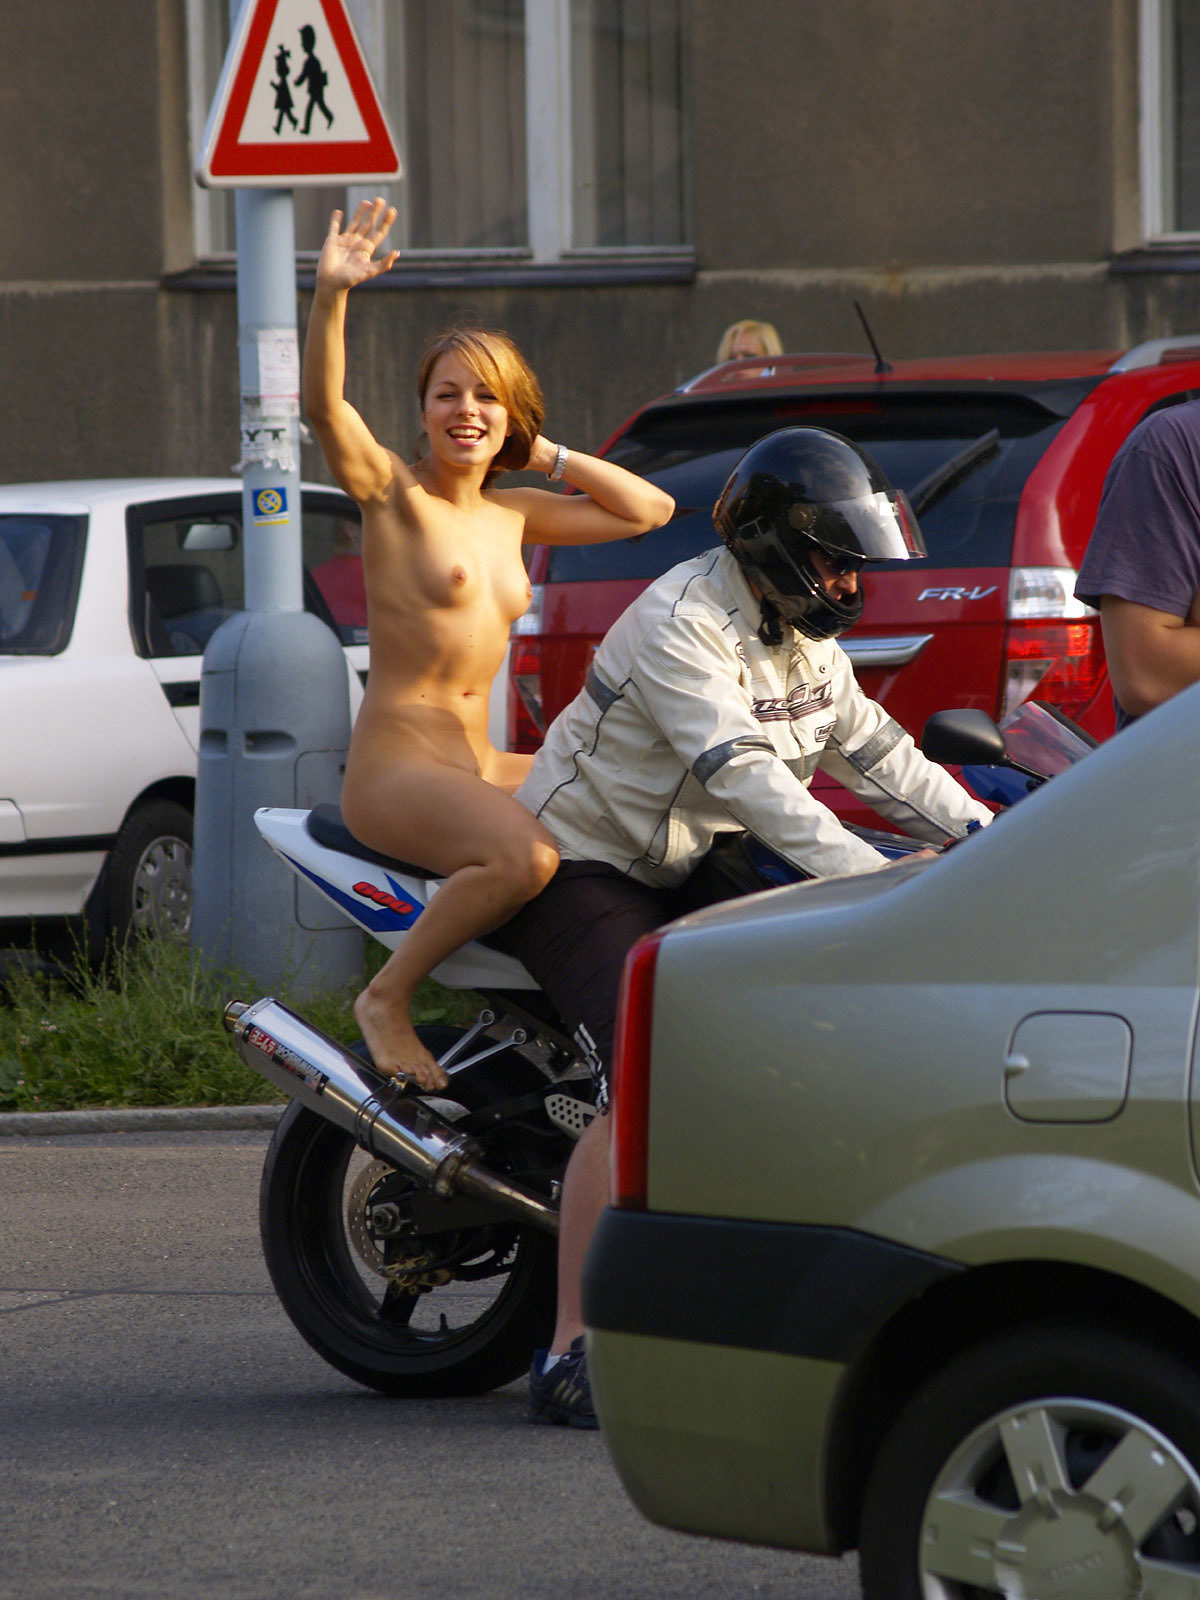 alane-e-motorbike-nude-in-public-73